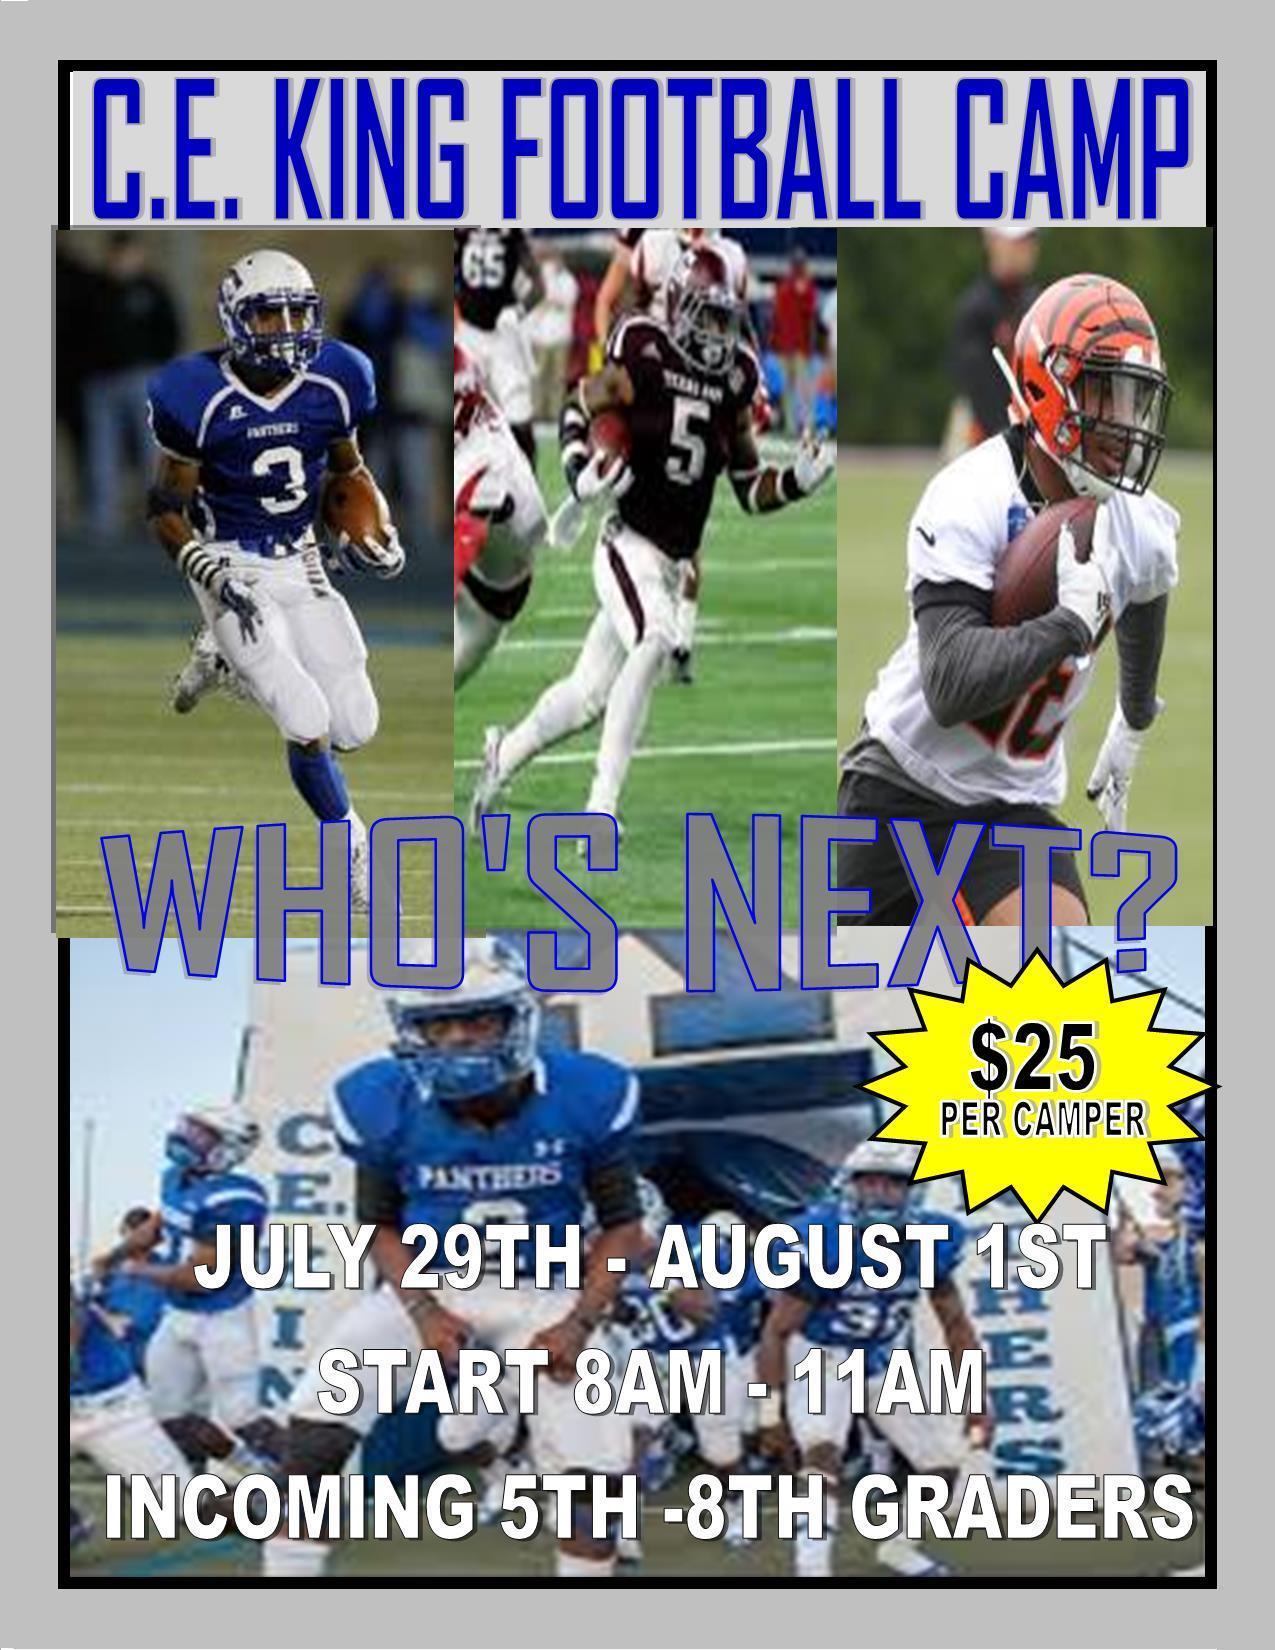 c_e_king_football_camp_flyer_1